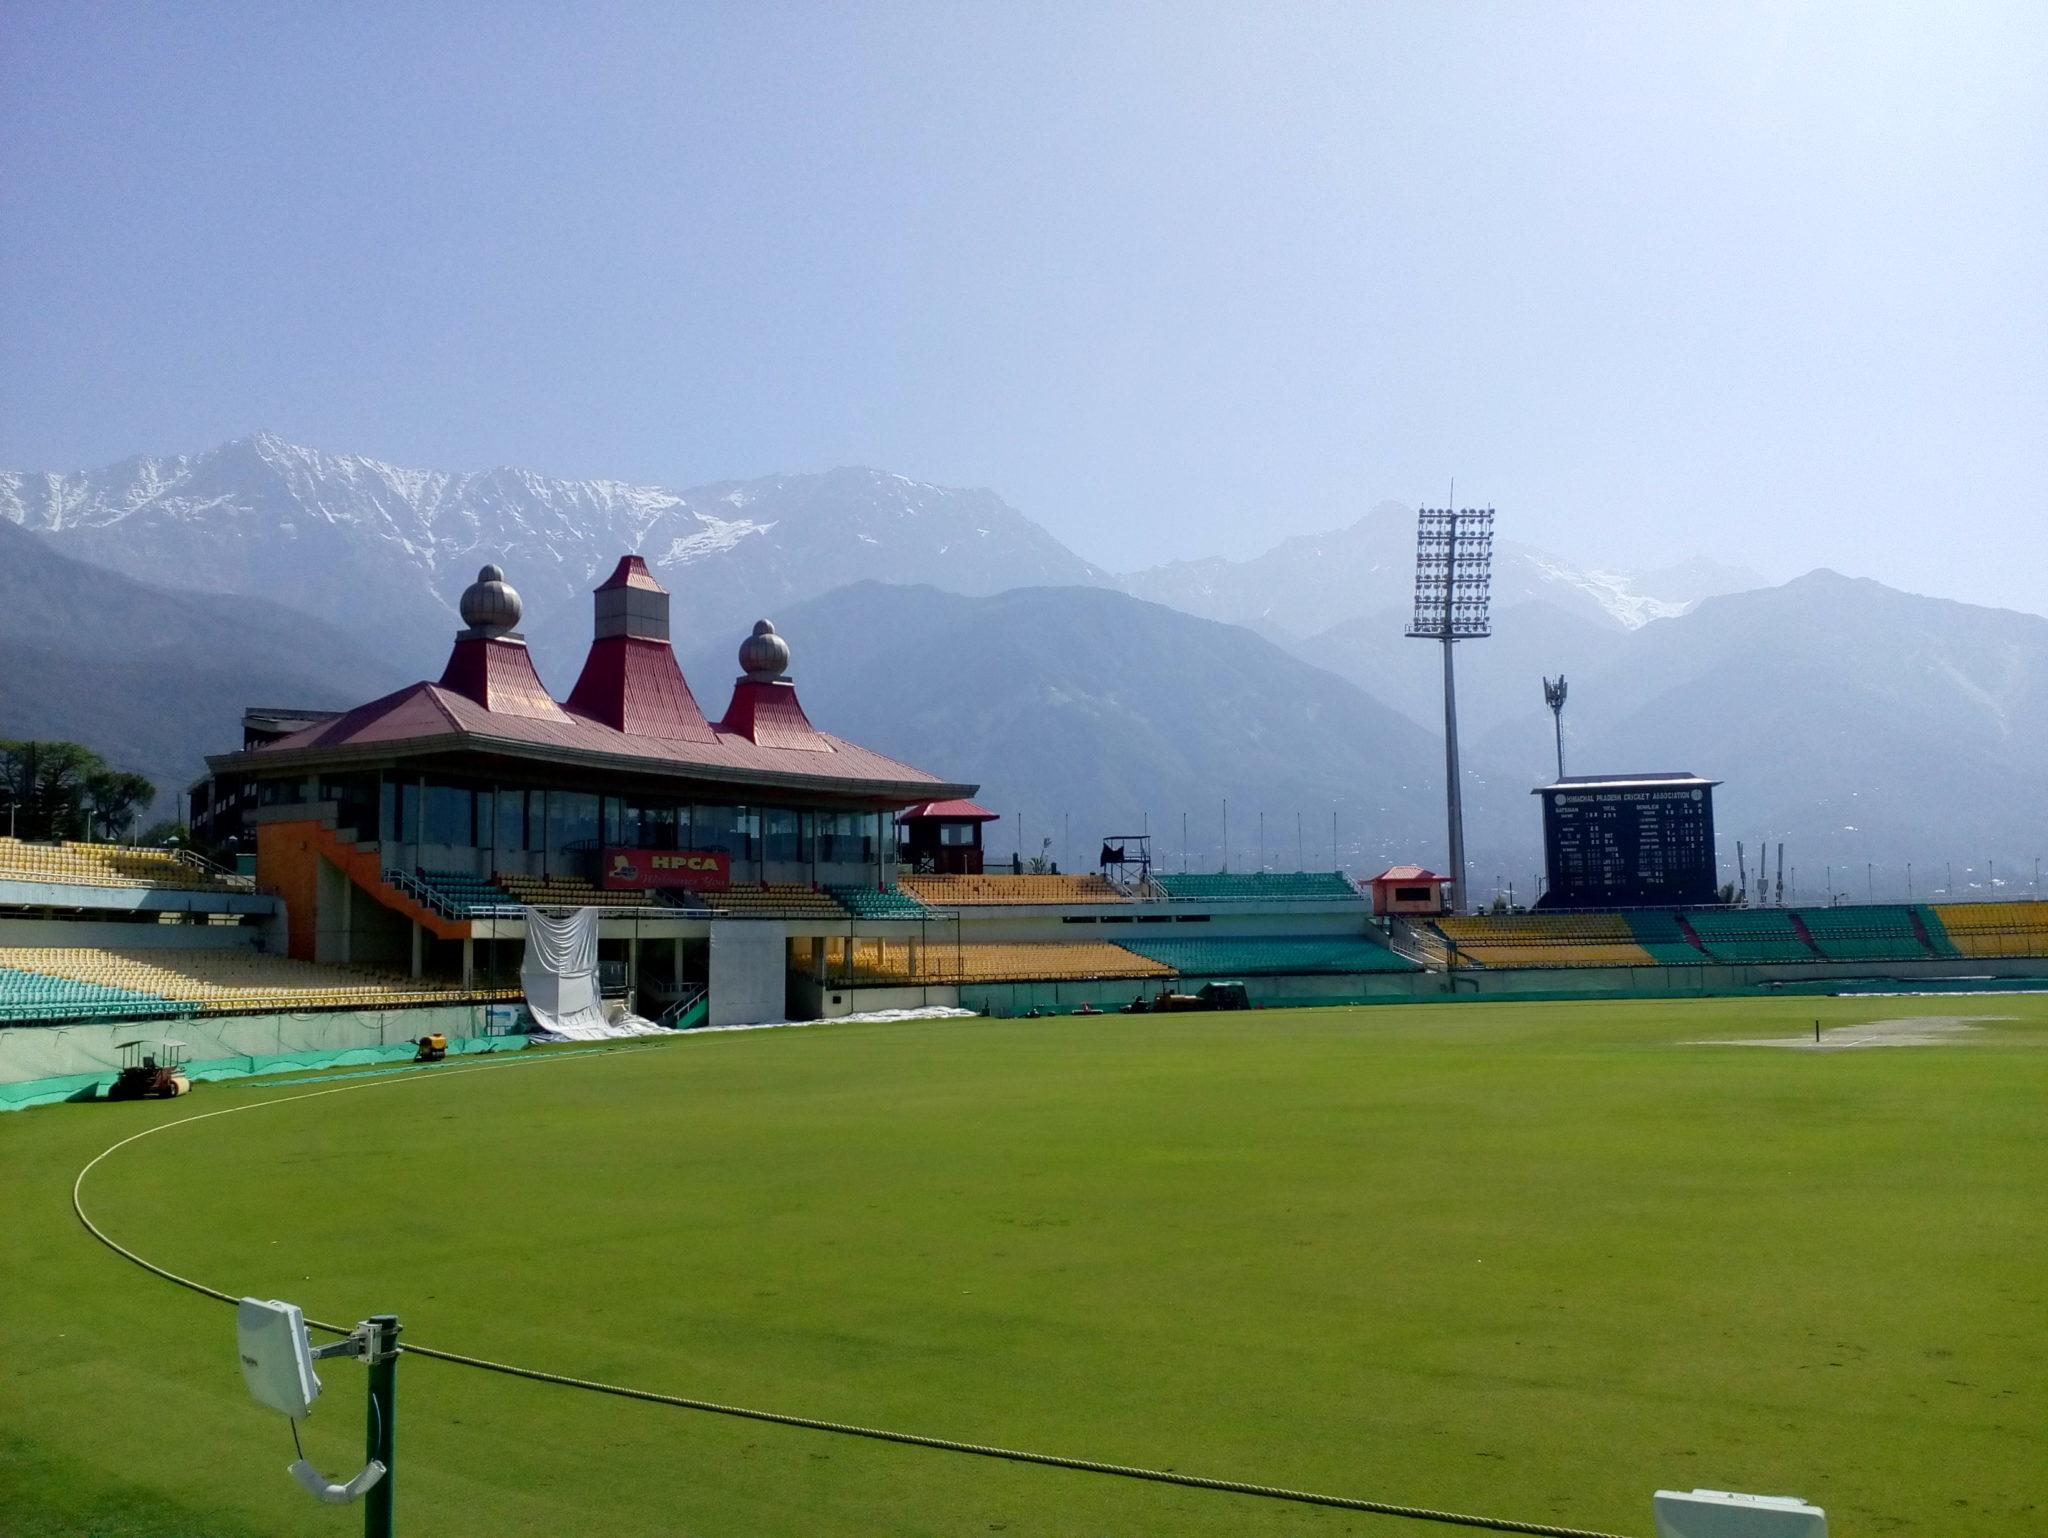 Summer Vacation in Dharamsala